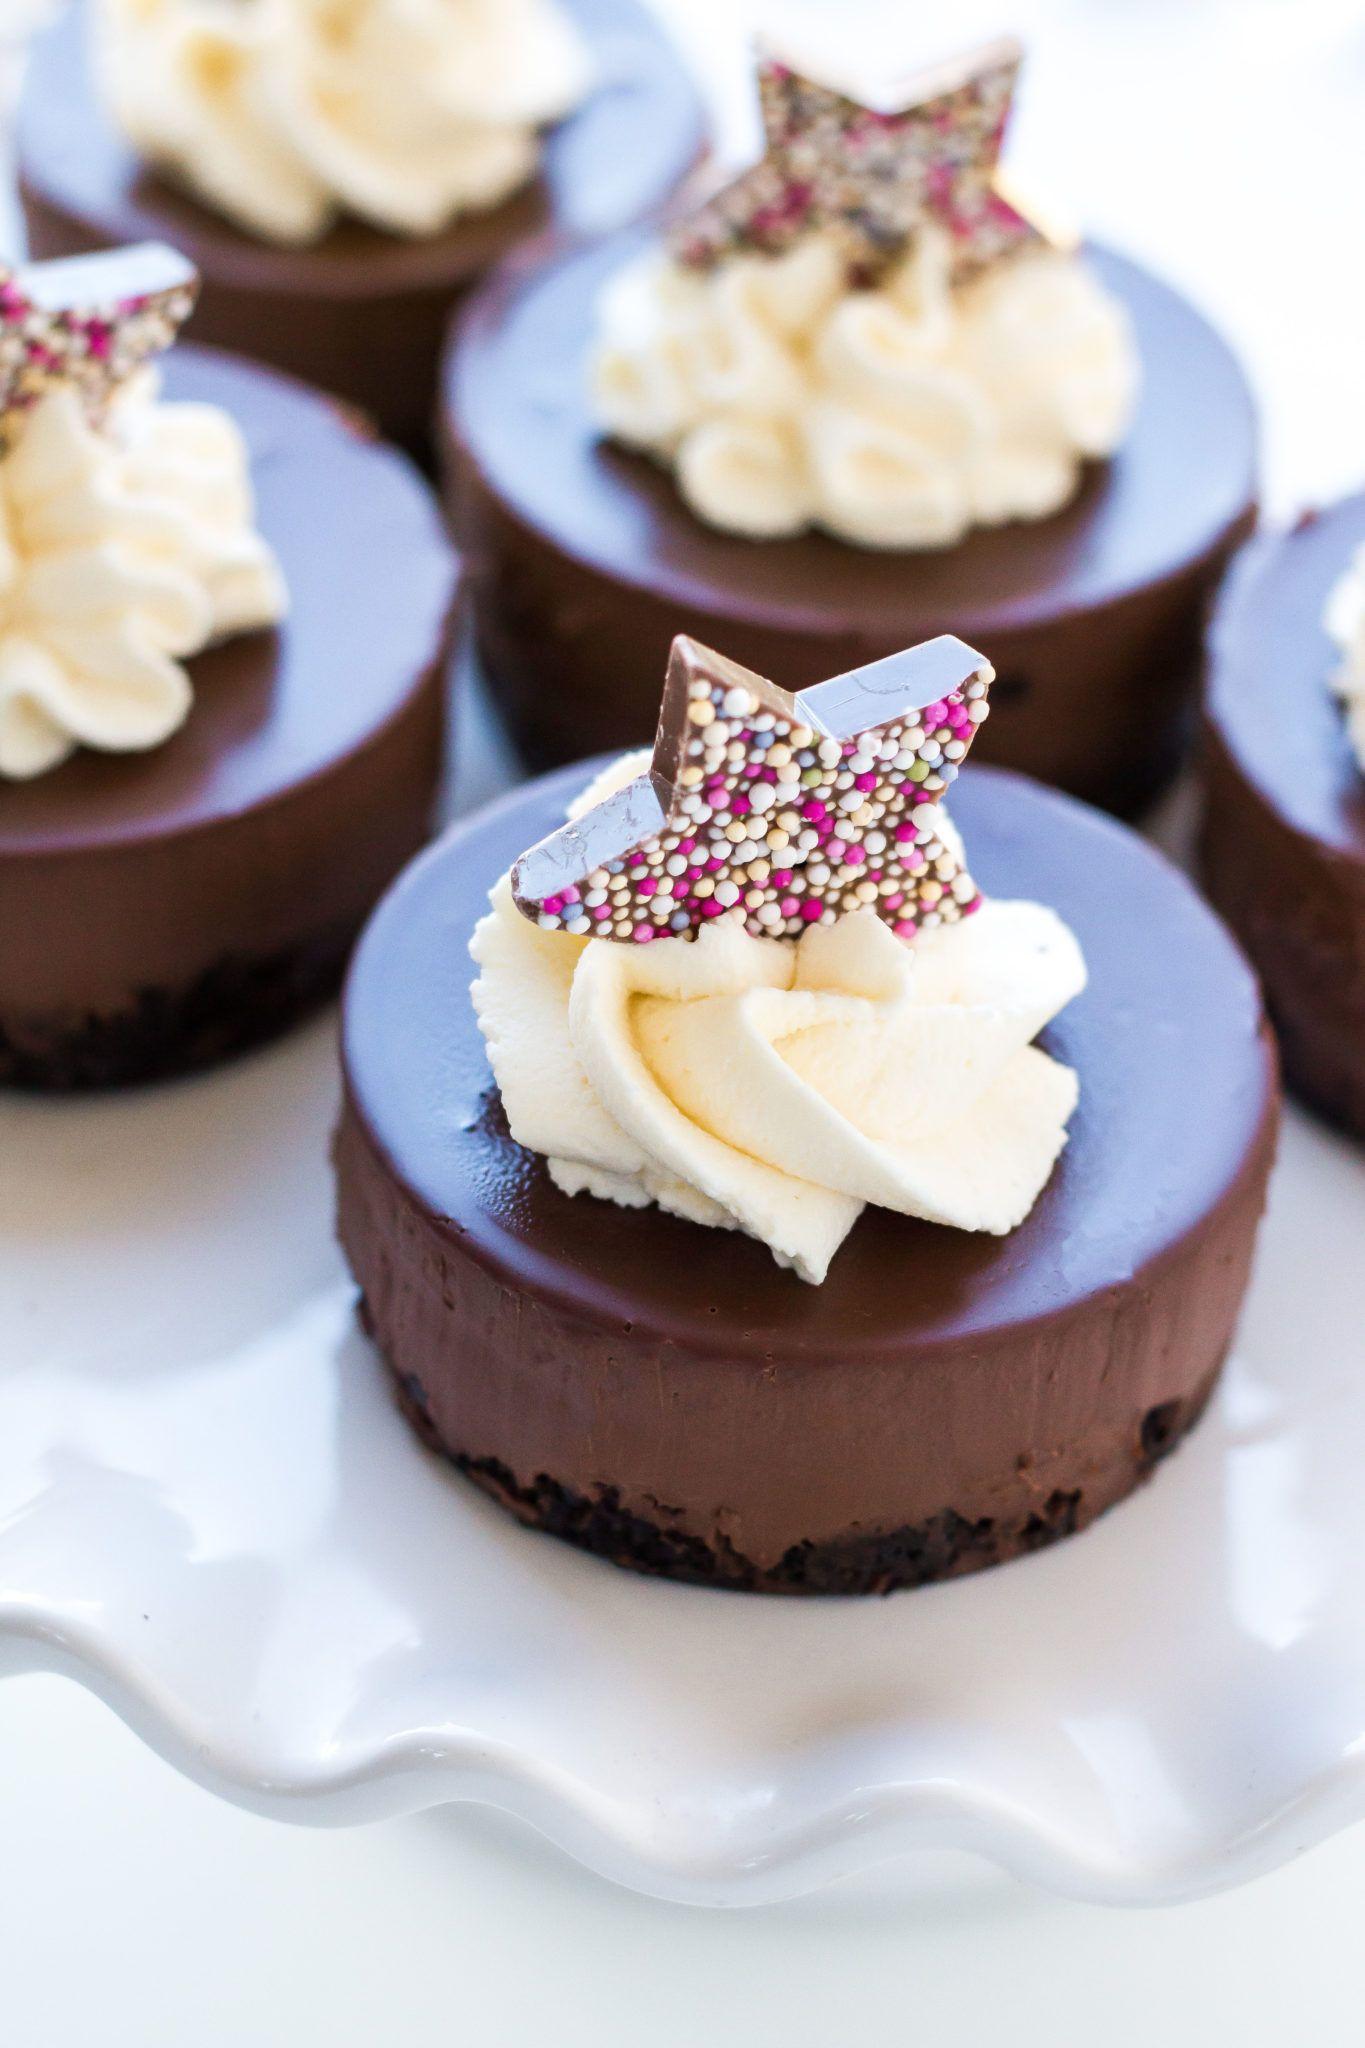 Easy chocolate dessert recipe in 2020 easy chocolate